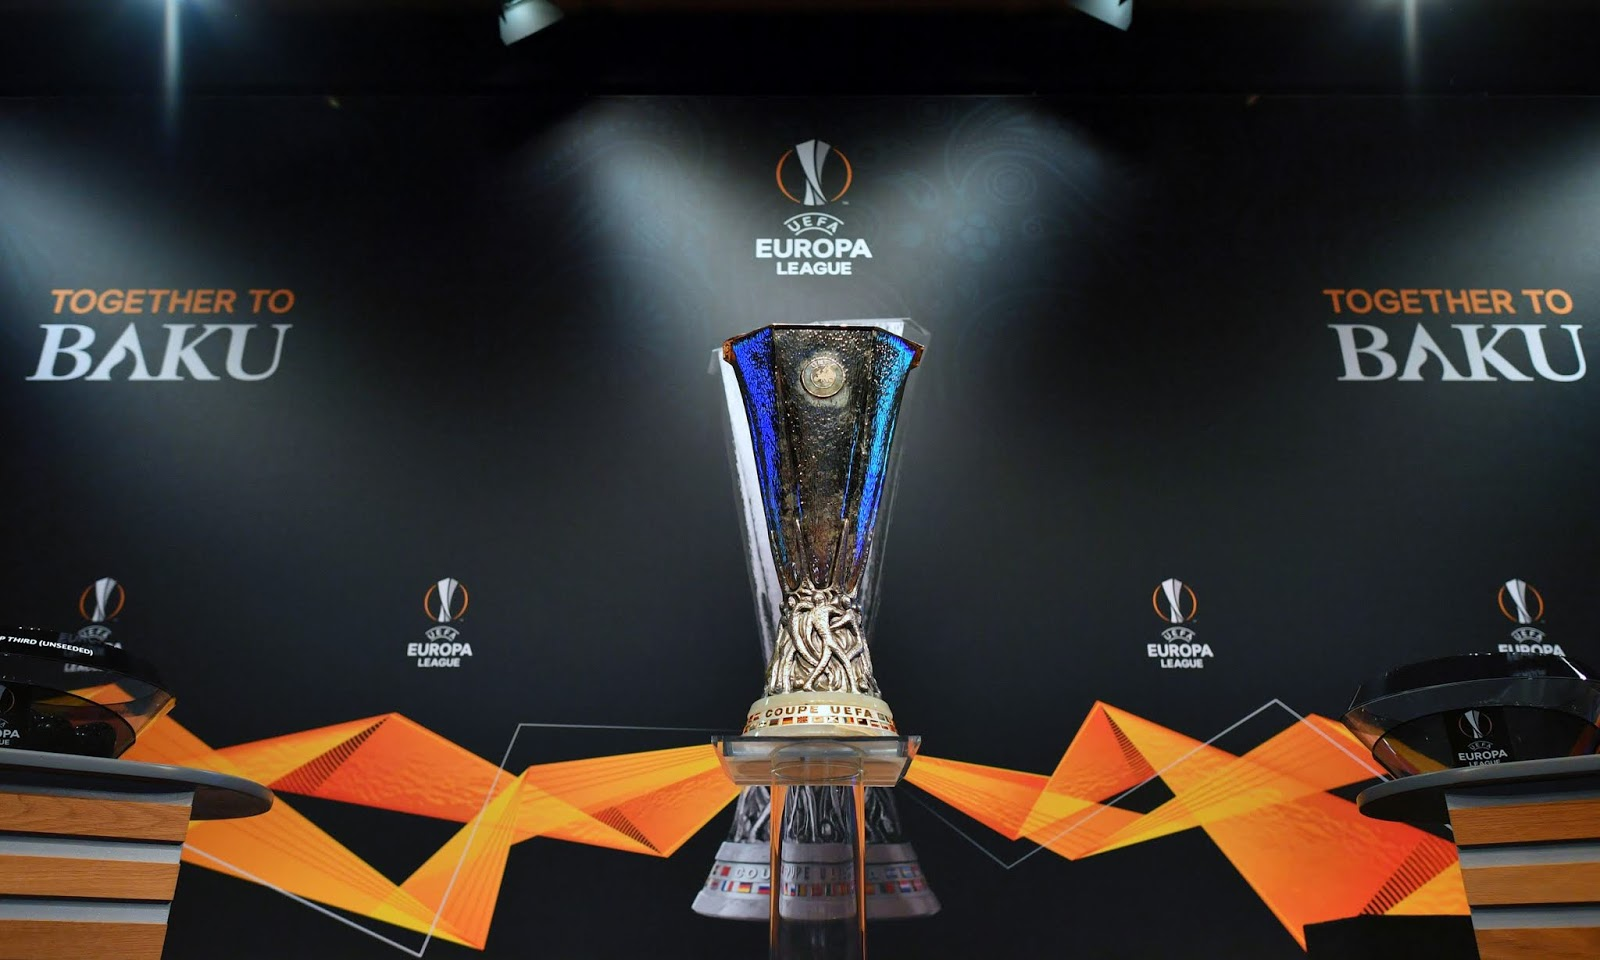 Europa League Hd Wallpapers